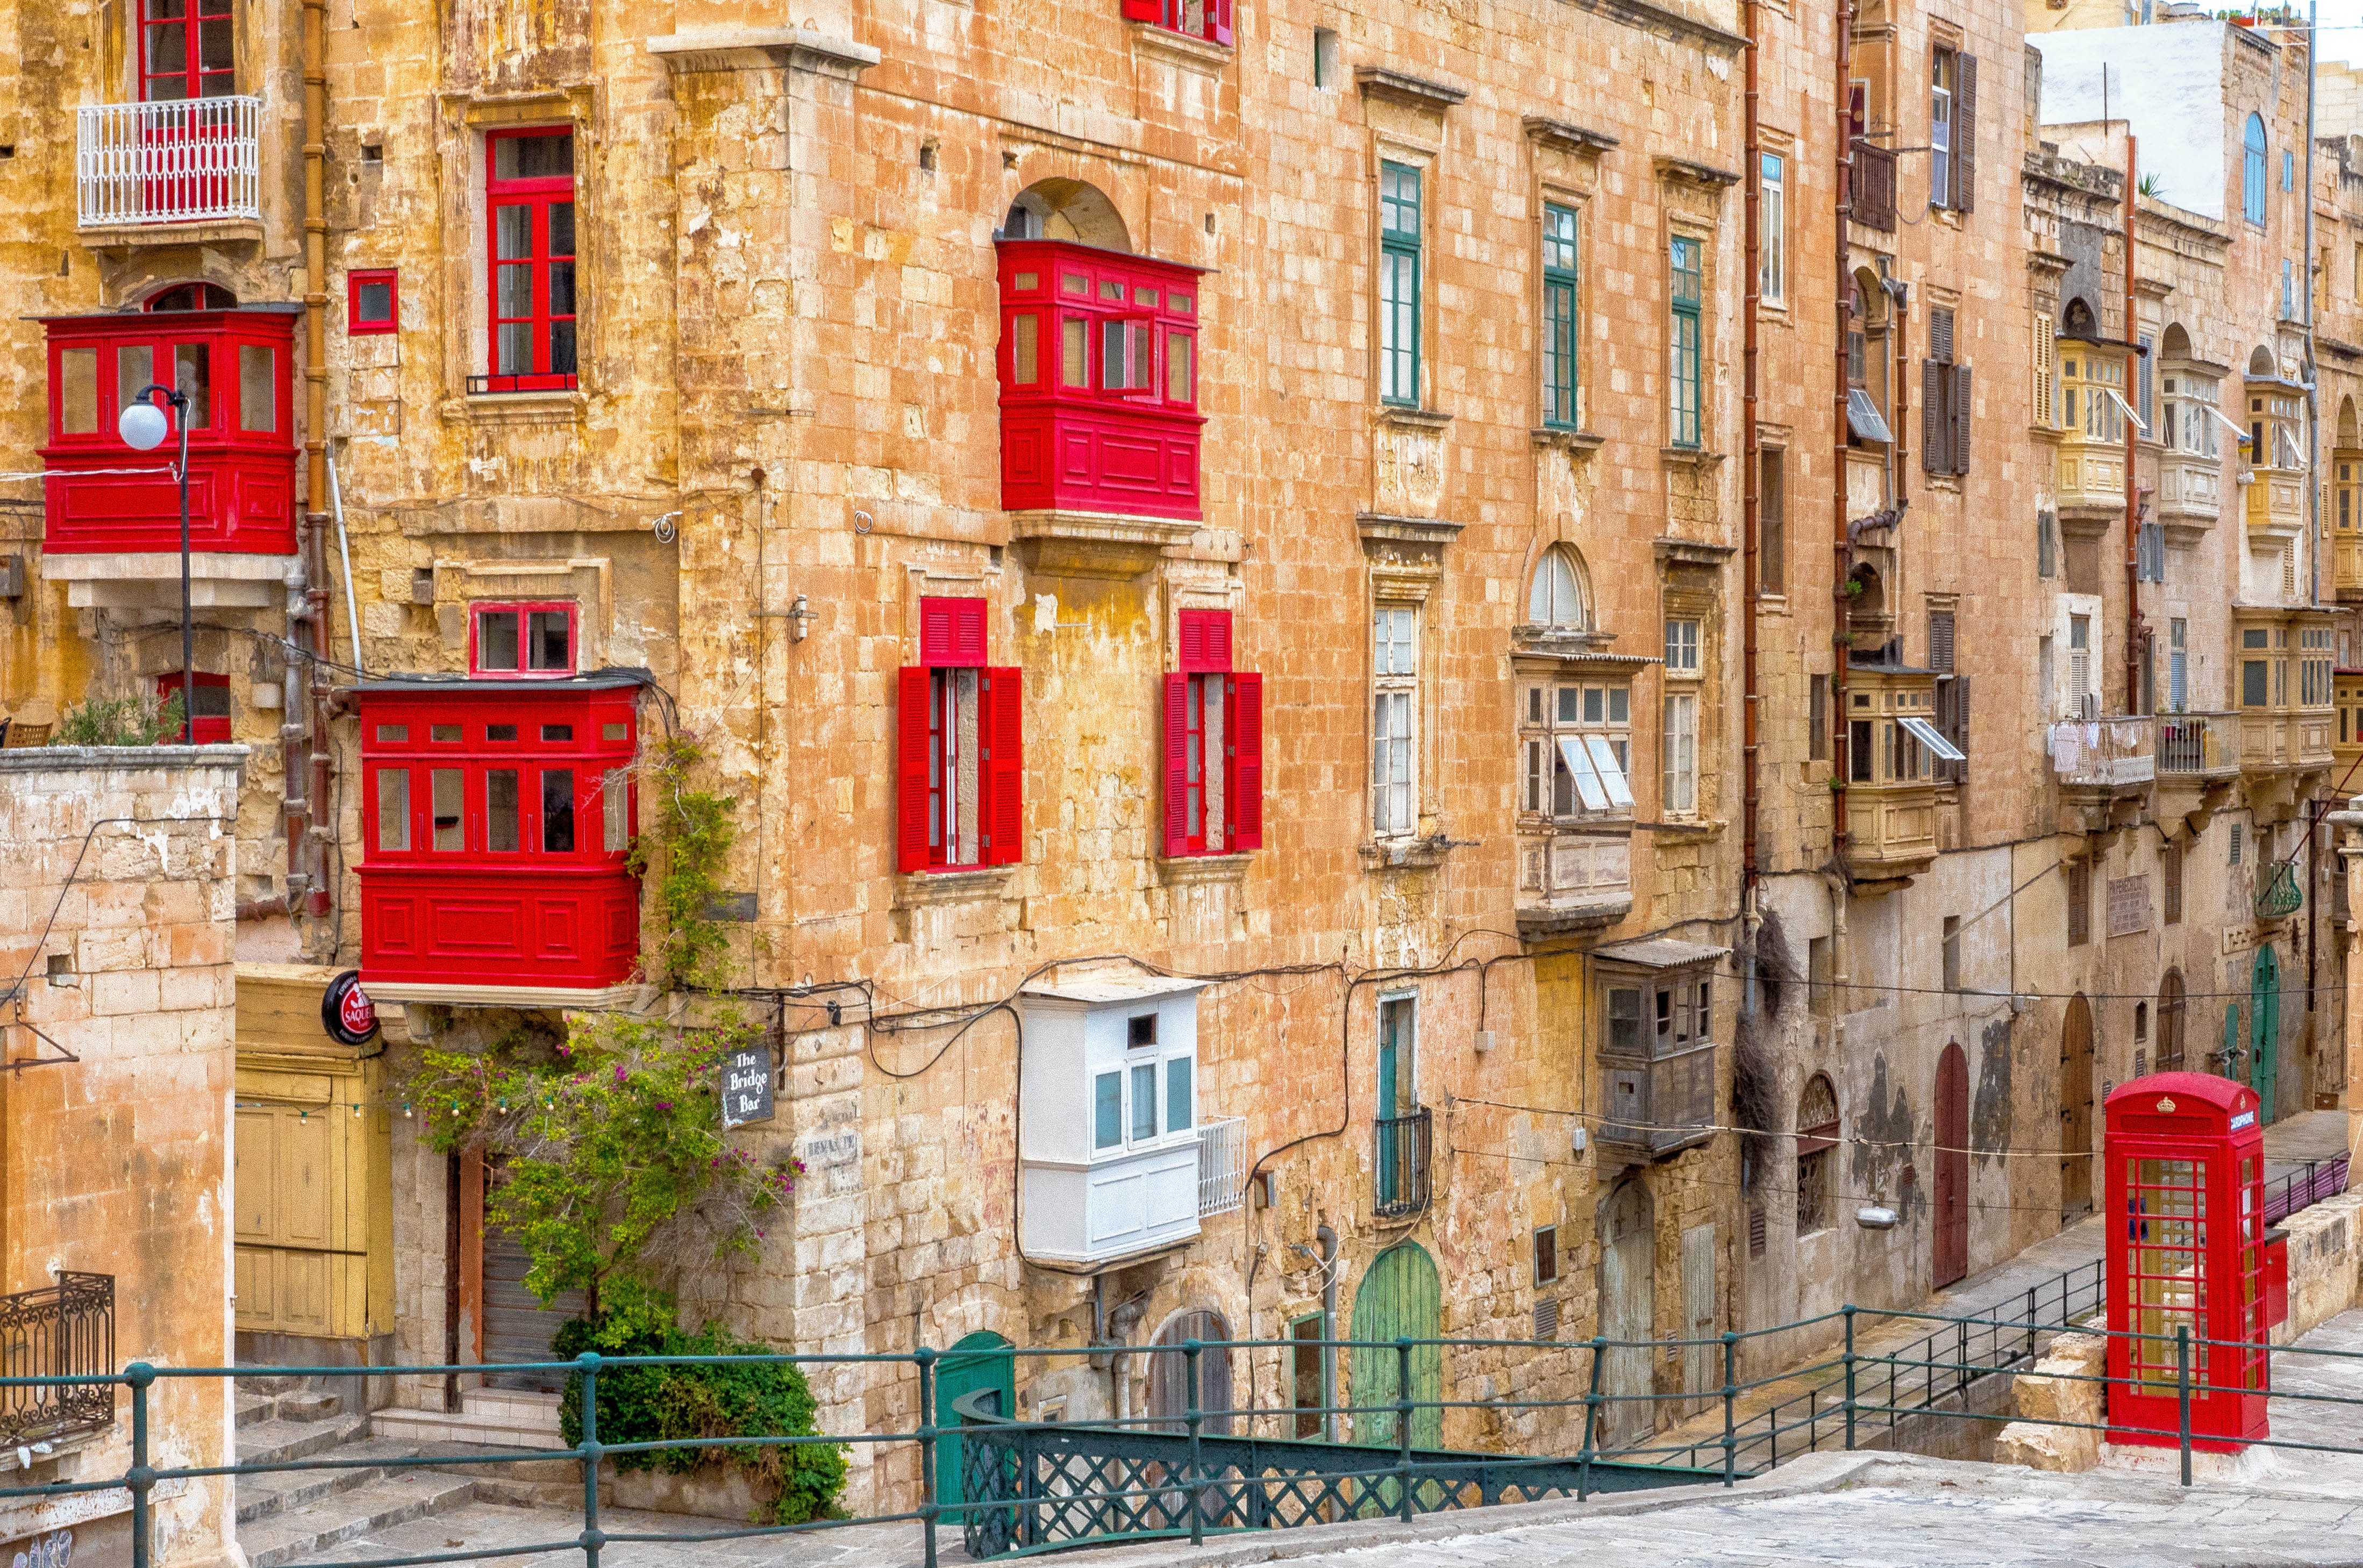 Video: Impressions of Malta